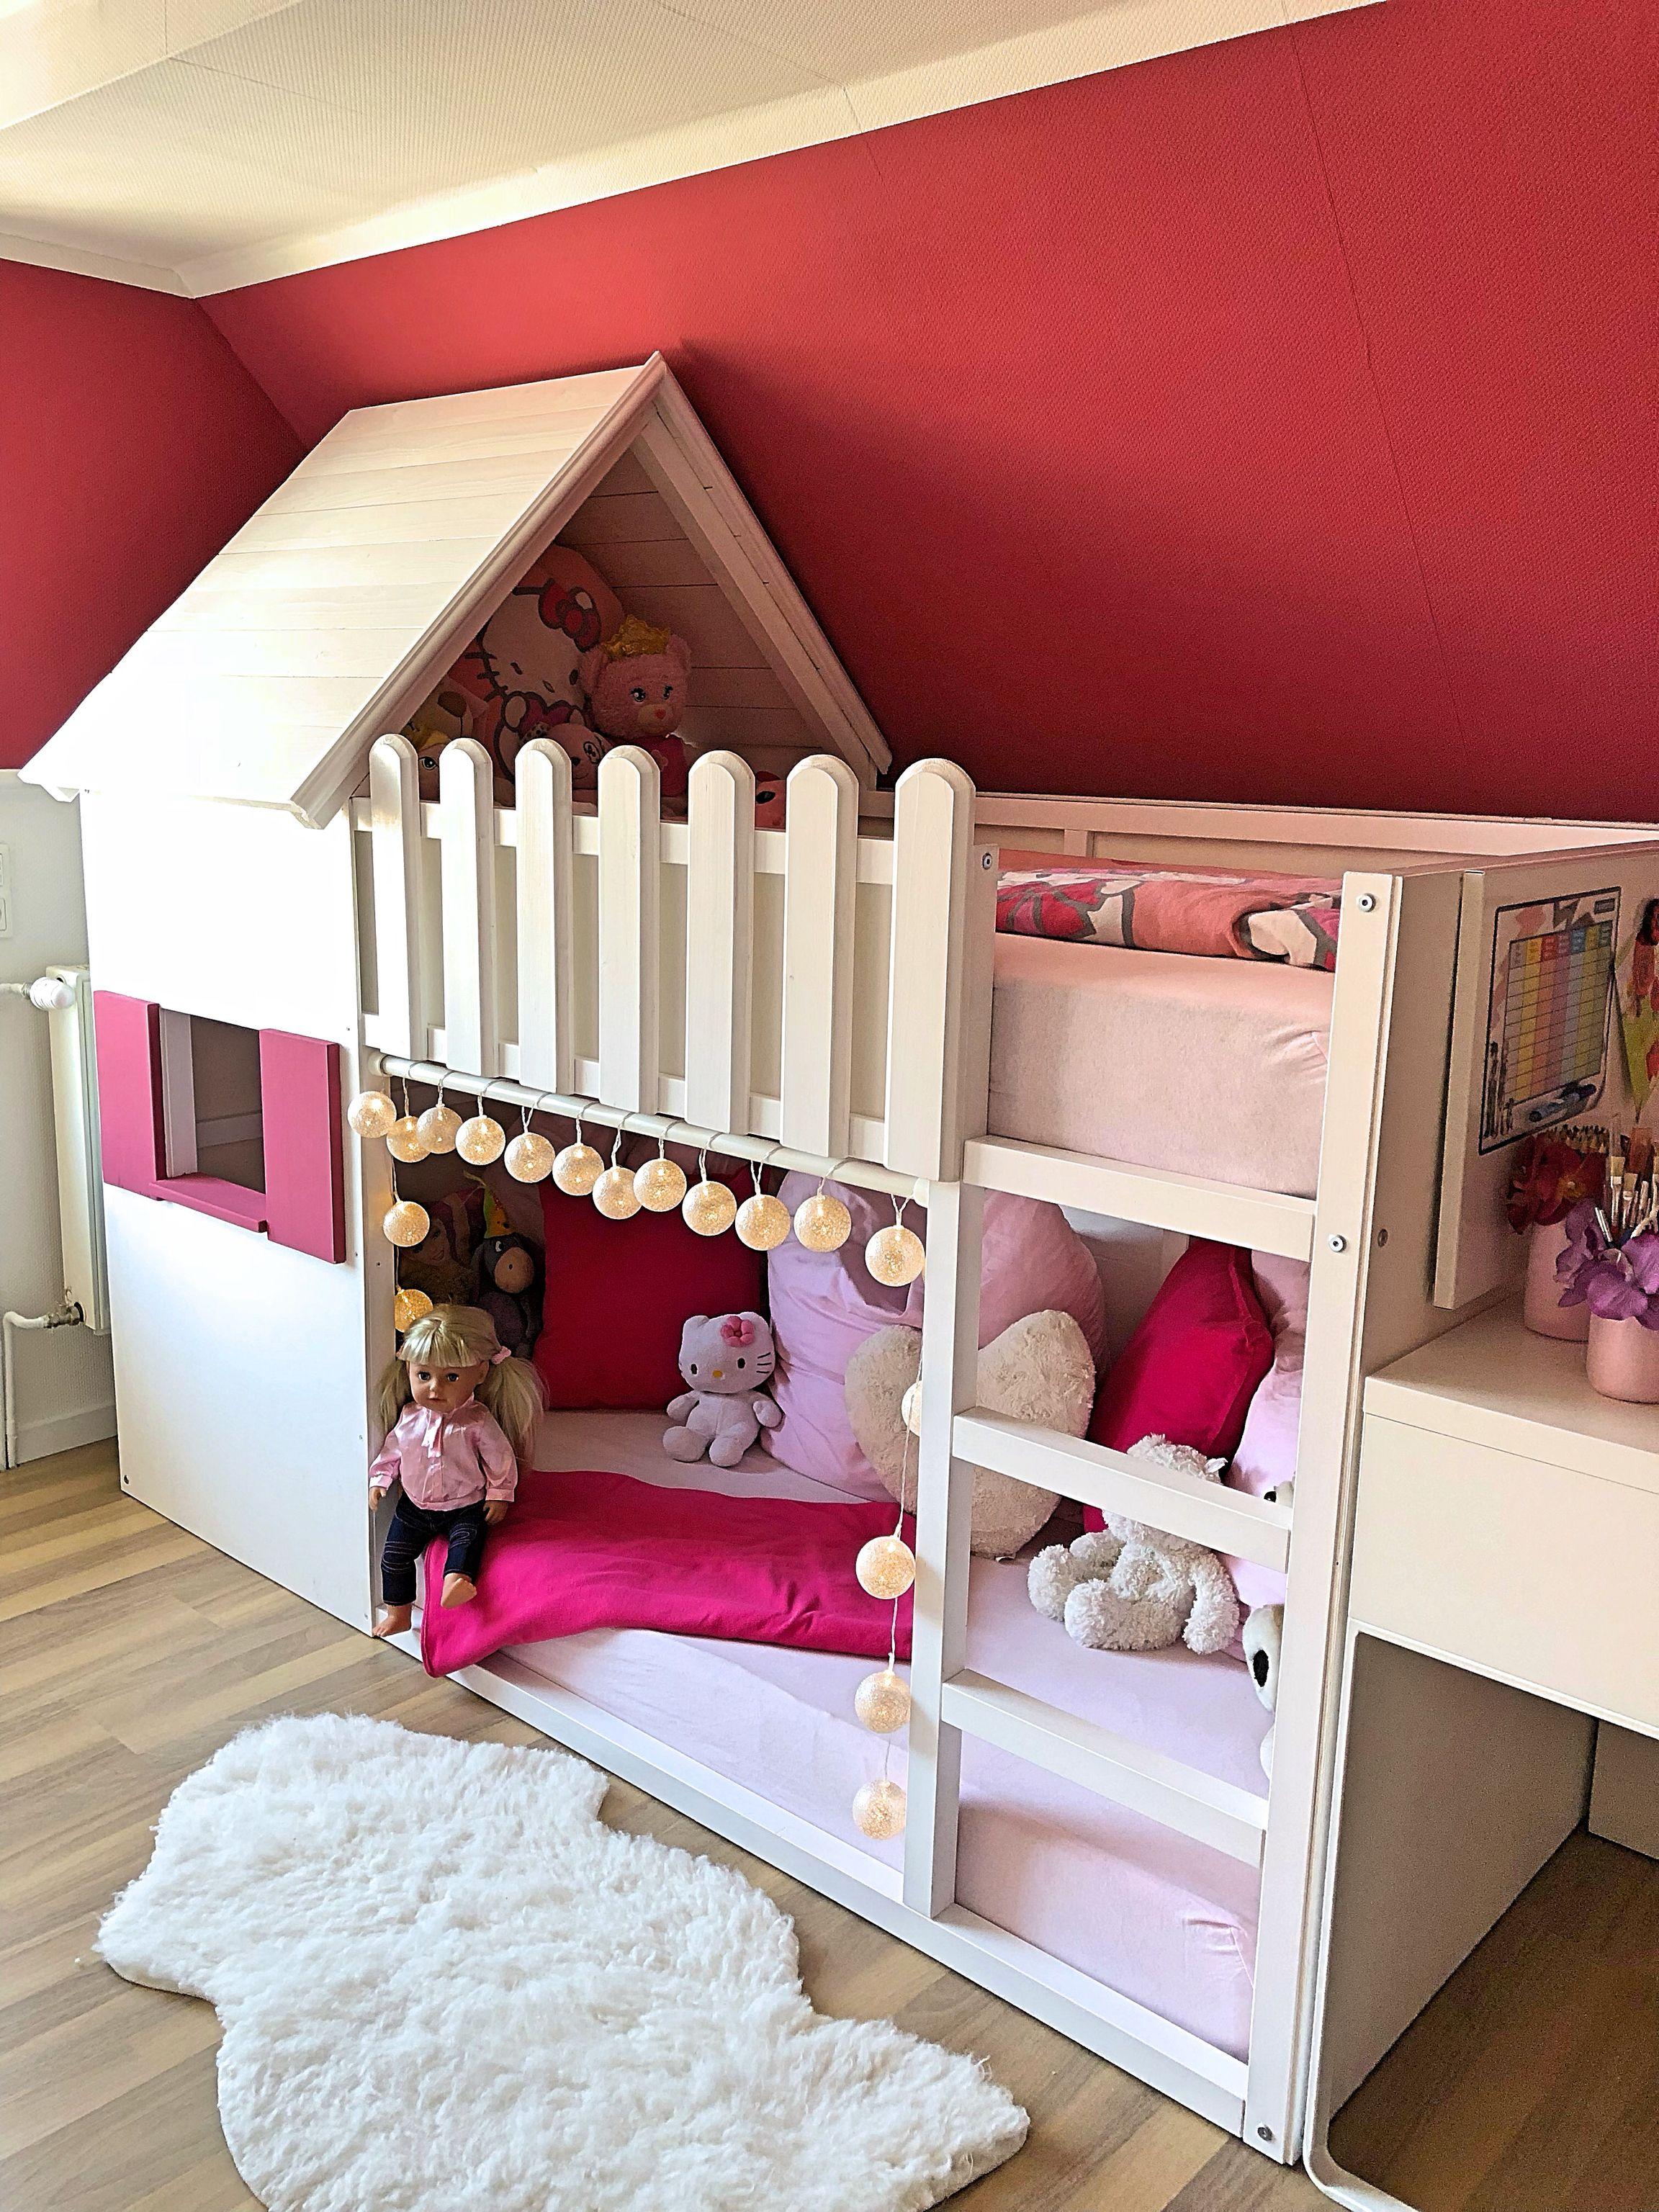 Selbstgebautes Hochbett Haus Bett kinderzimmer